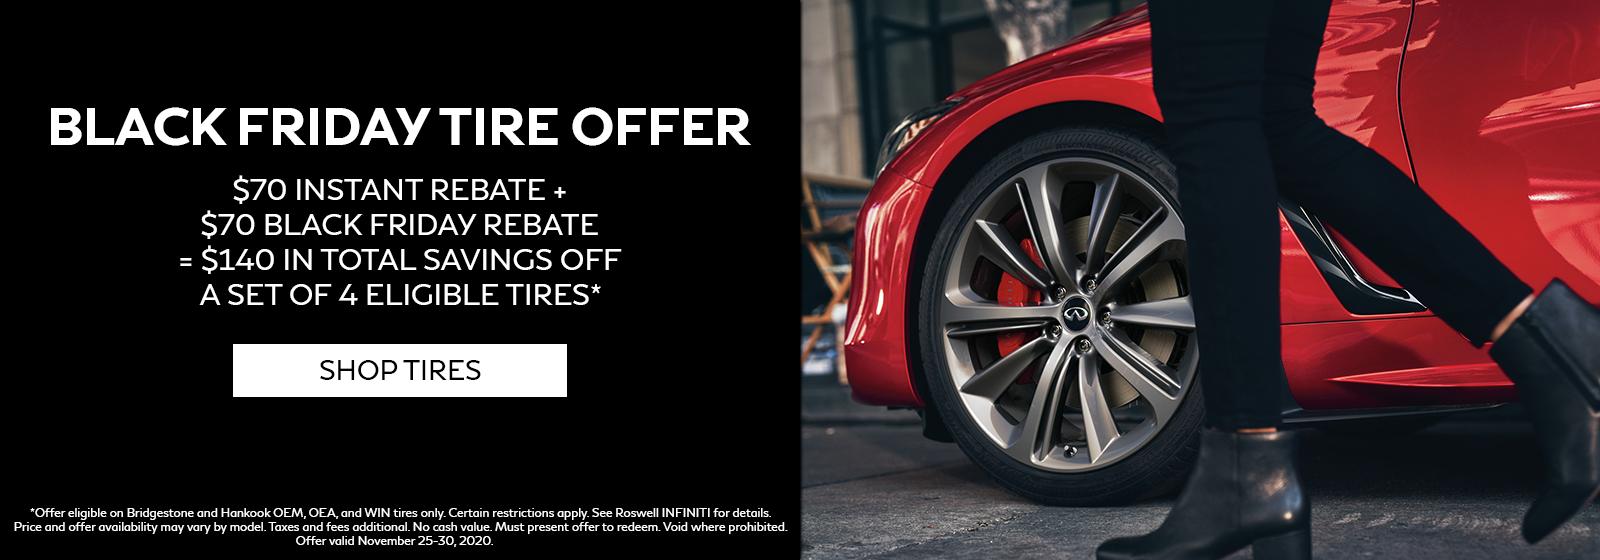 Black Friday Tire Offer